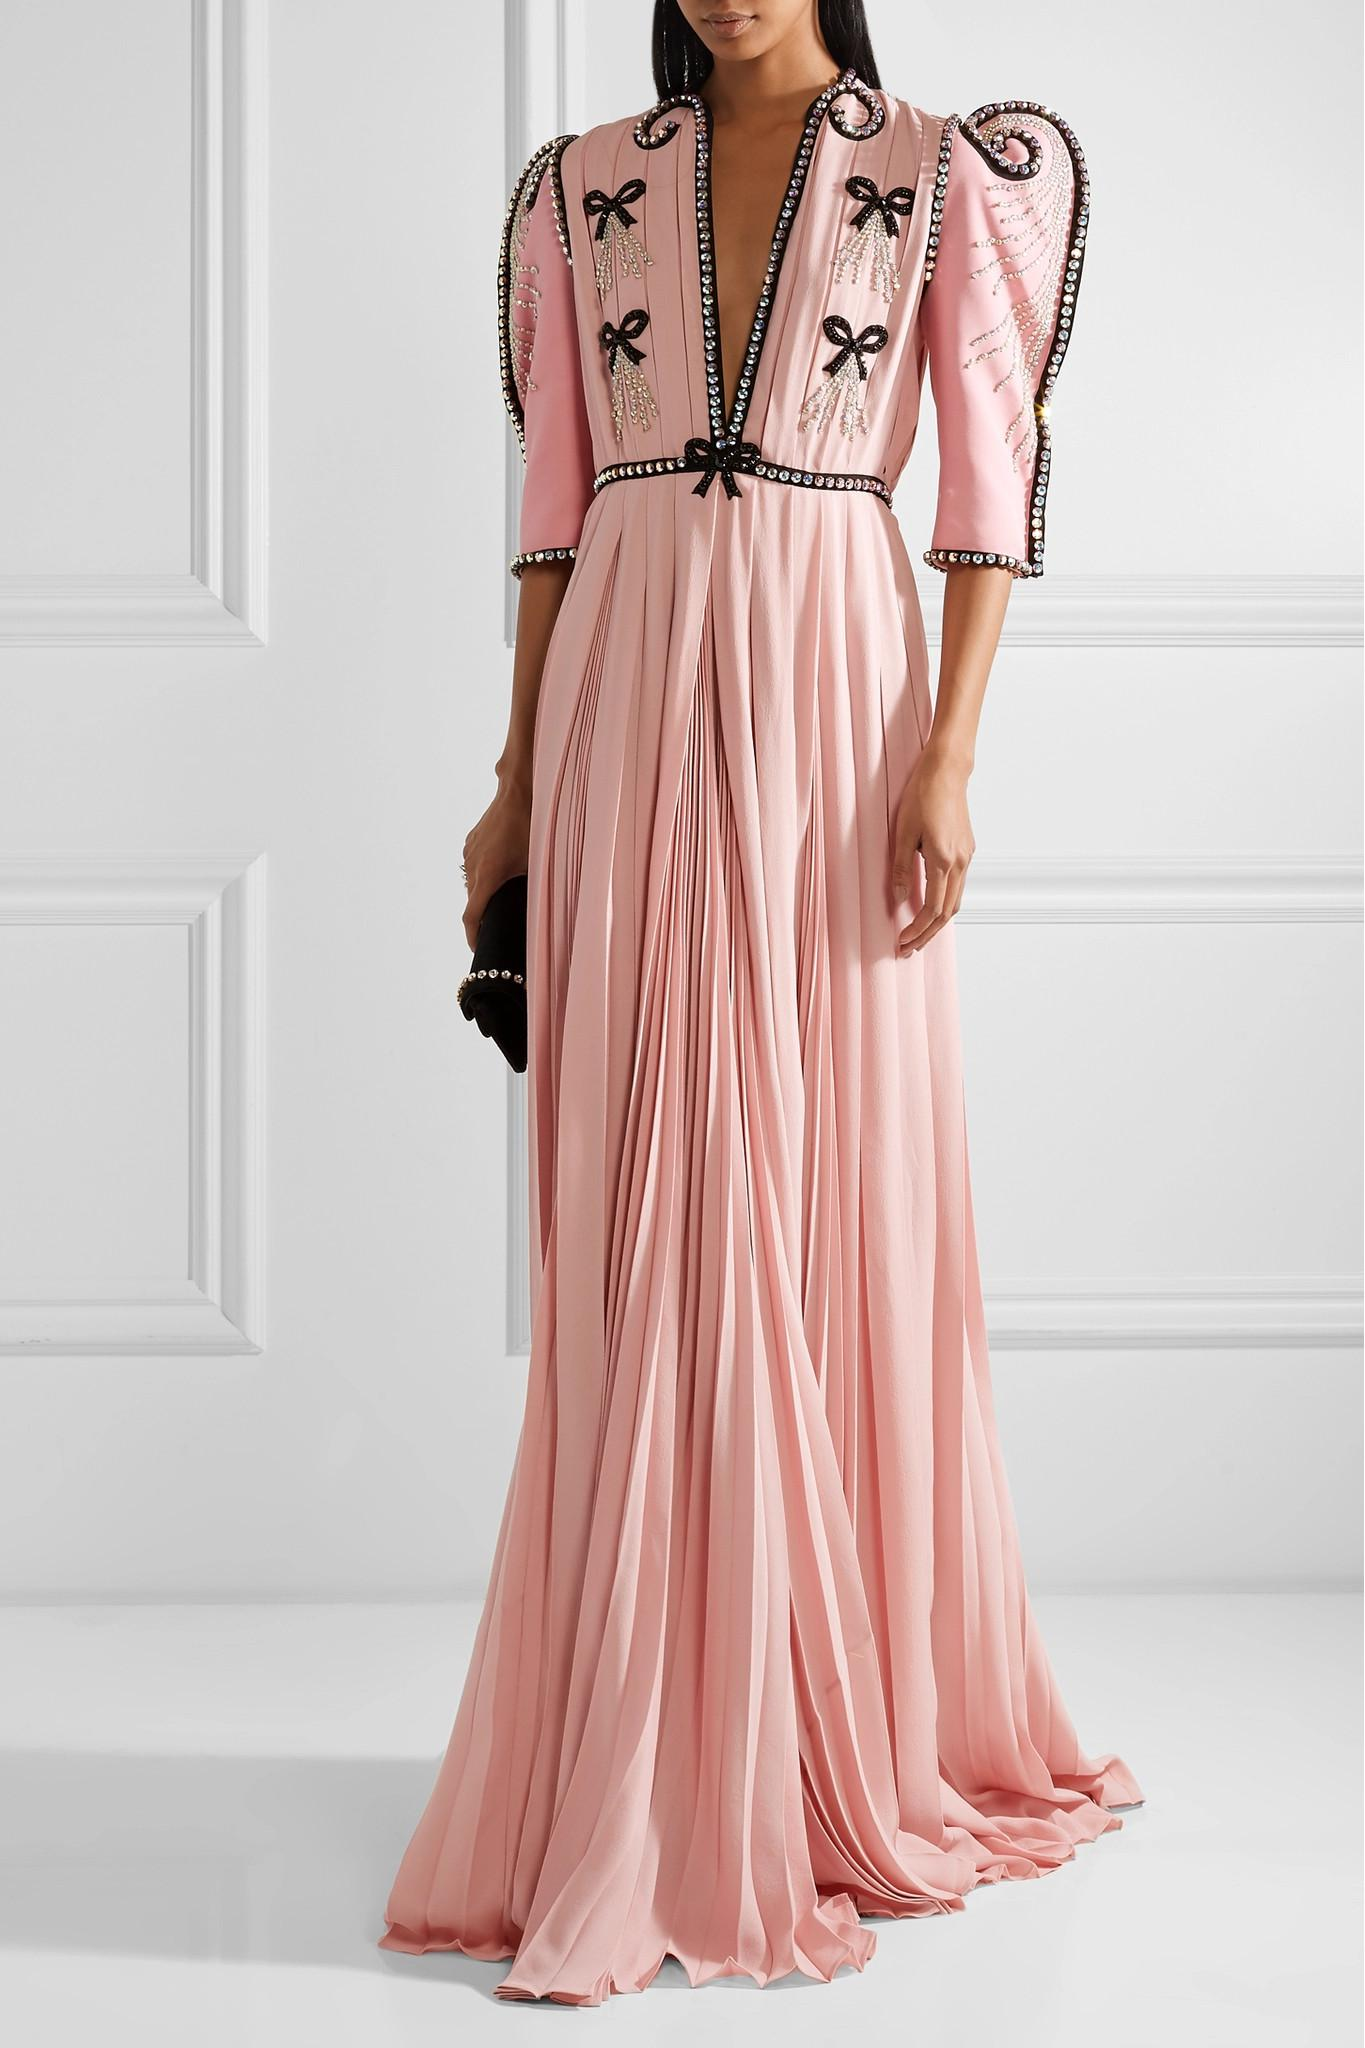 6fb88ae2e Gucci Swarovski Crystal-embellished Wool And Silk-blend And Plissé ...